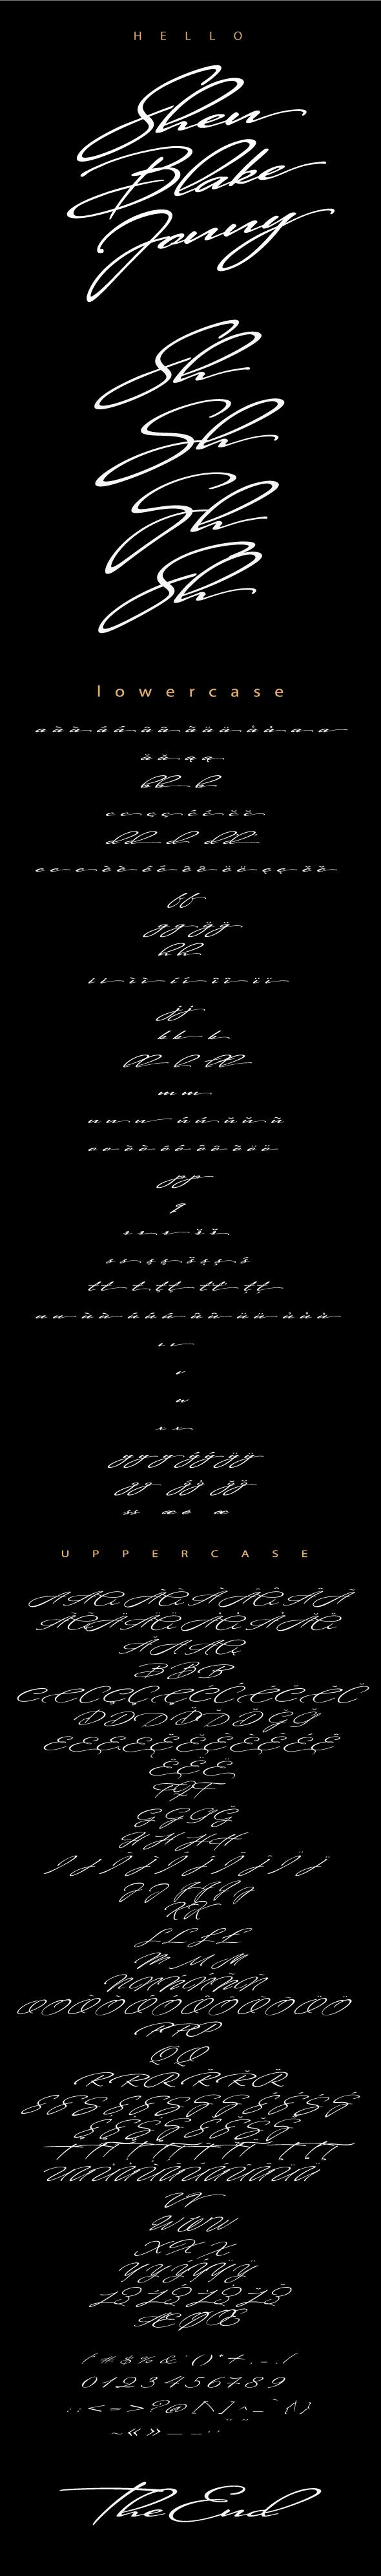 Shen - Fonts